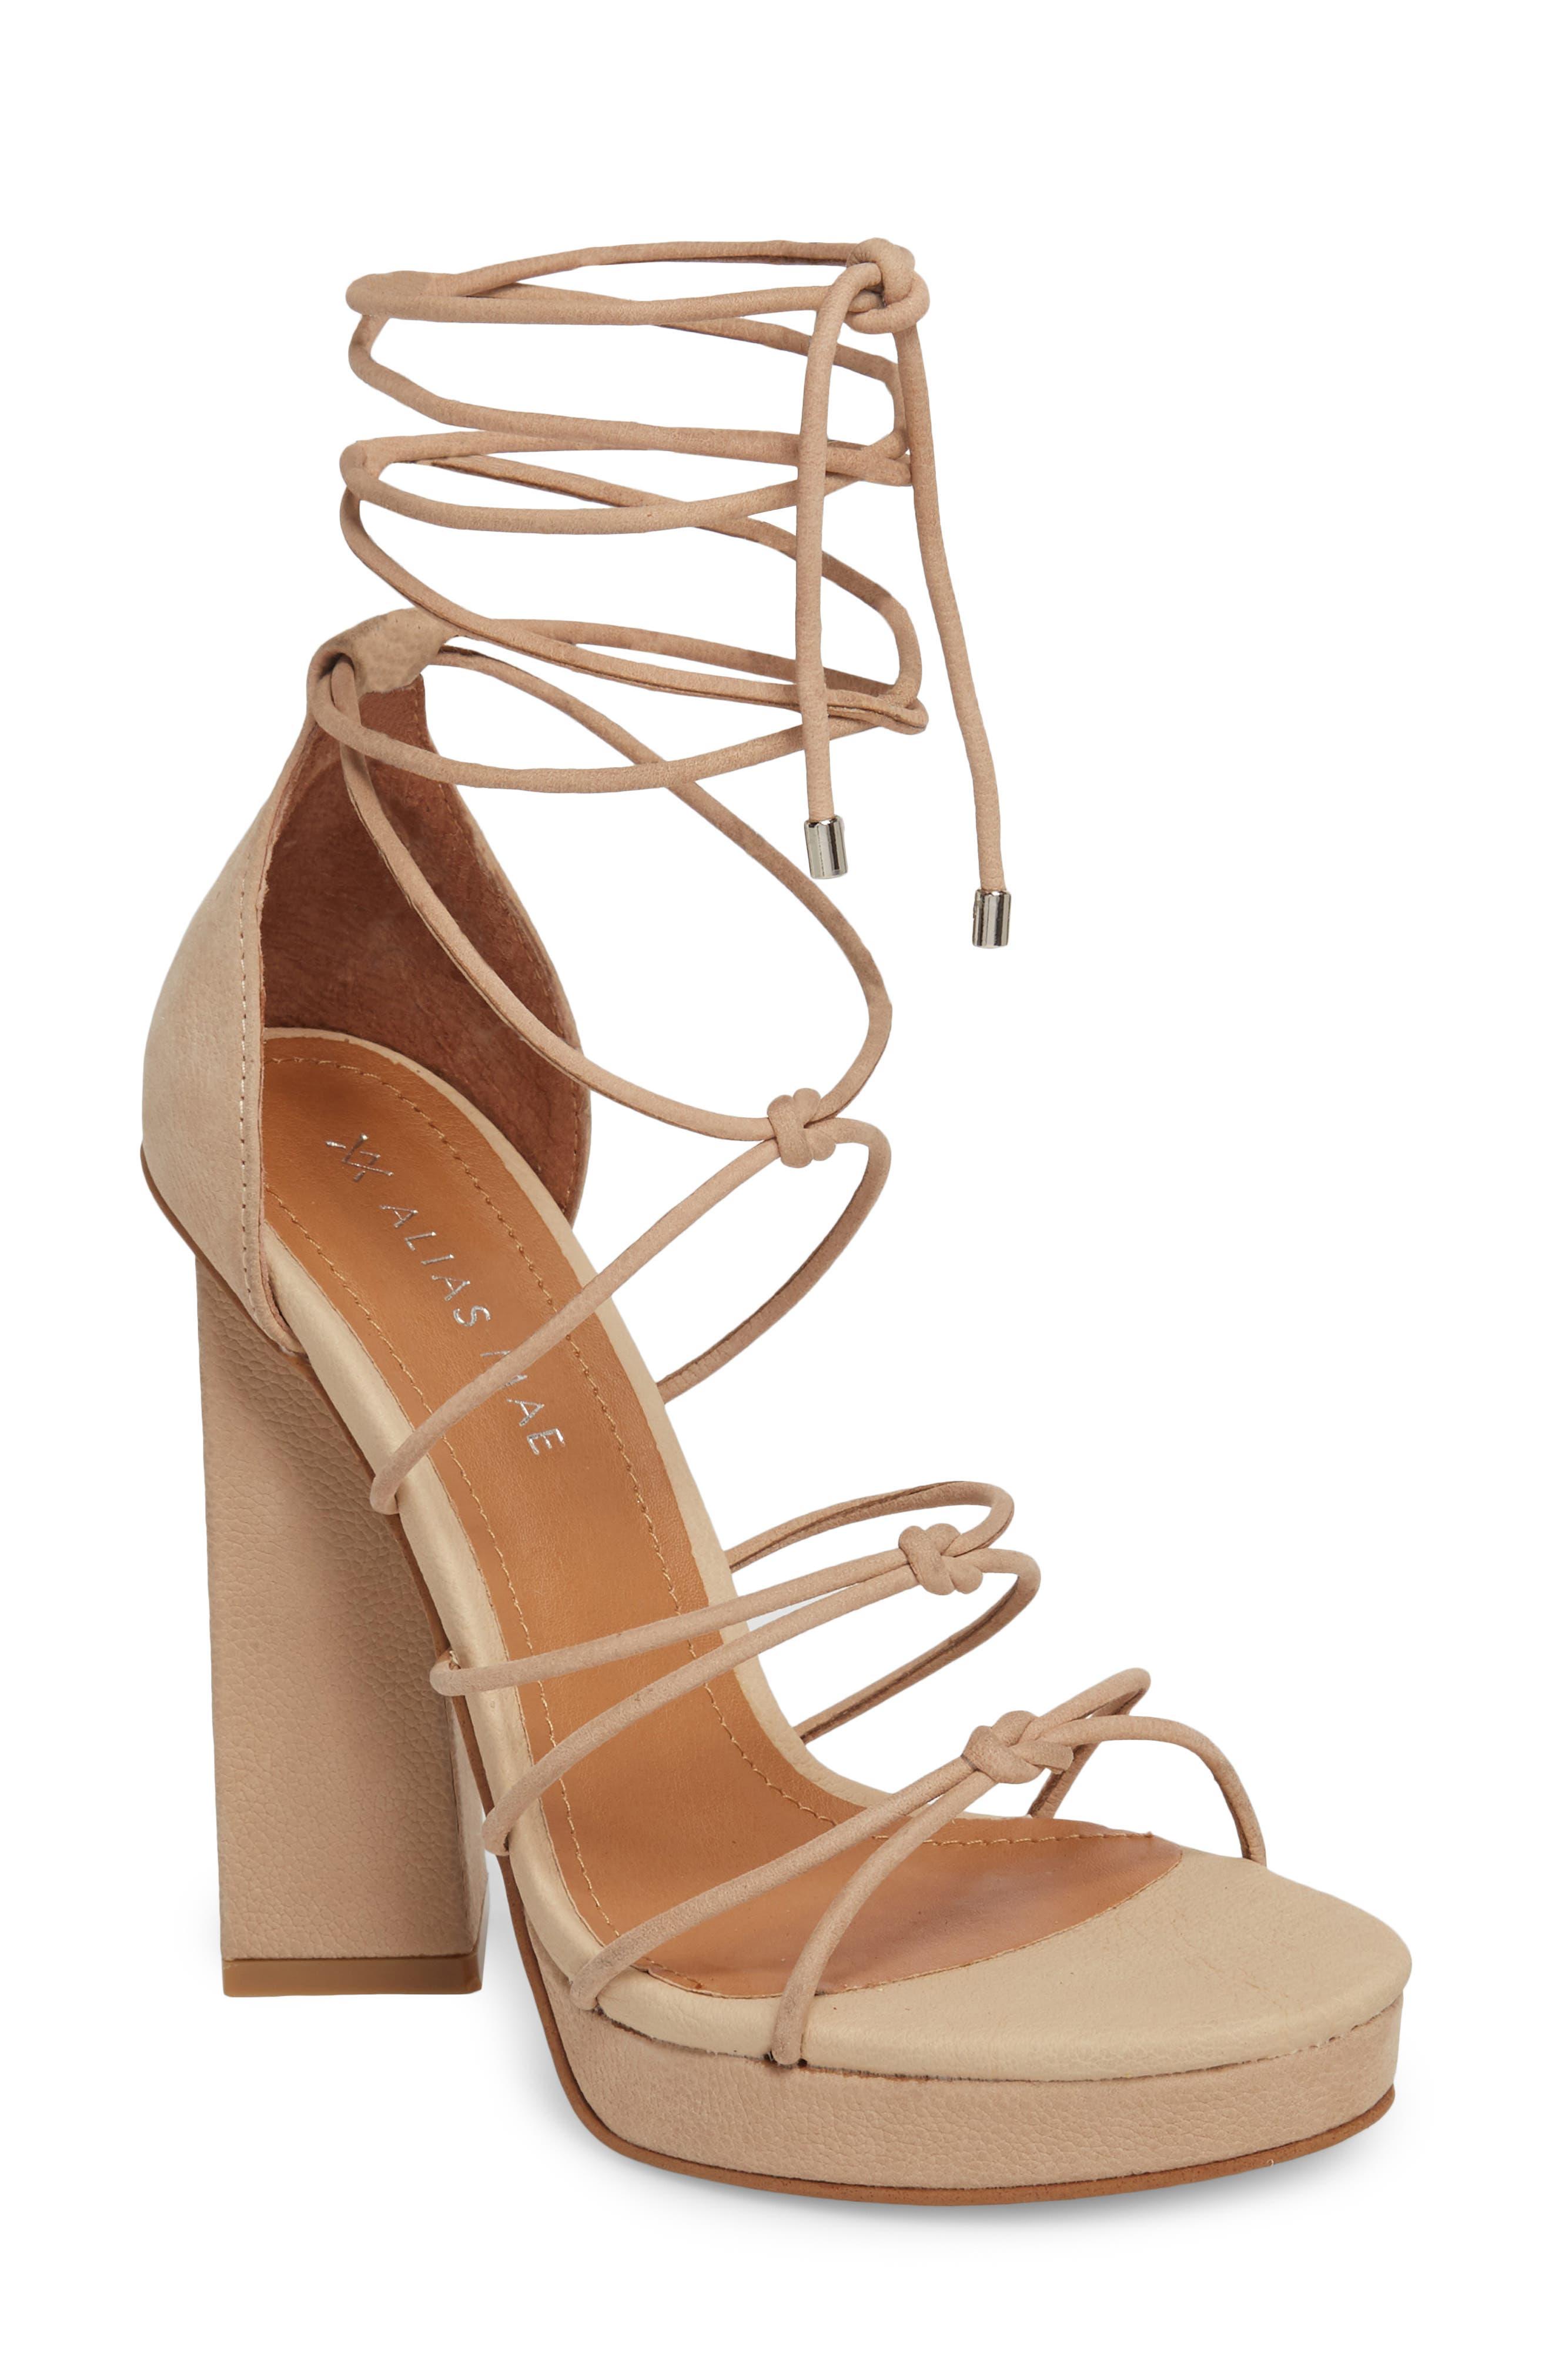 Alias Mae Bordega Ankle Wrap Sandal, Beige